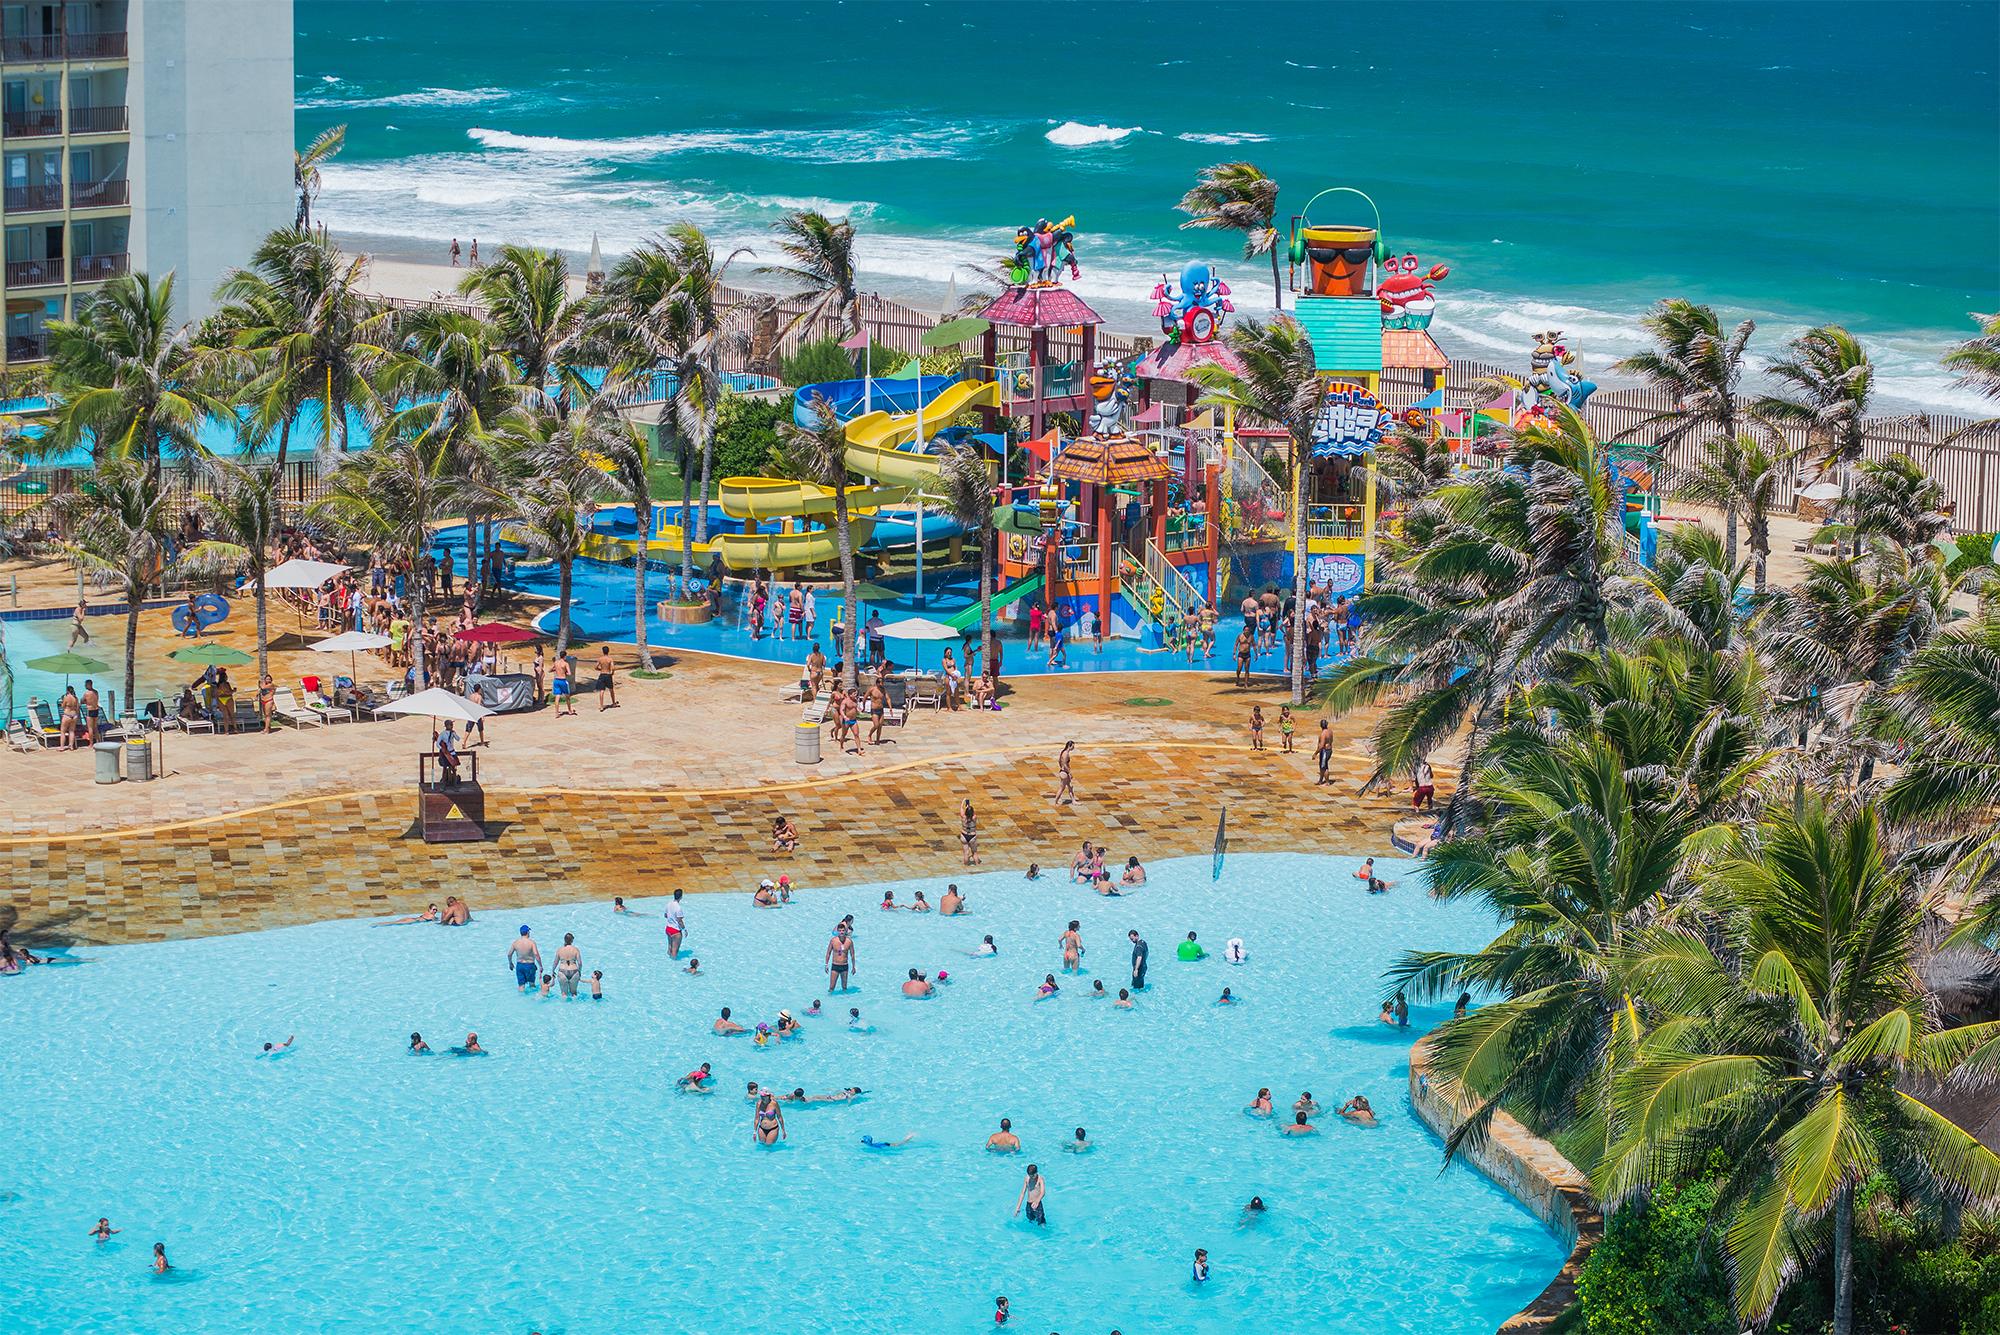 Beach Park Fortaleza Ceara Brasil